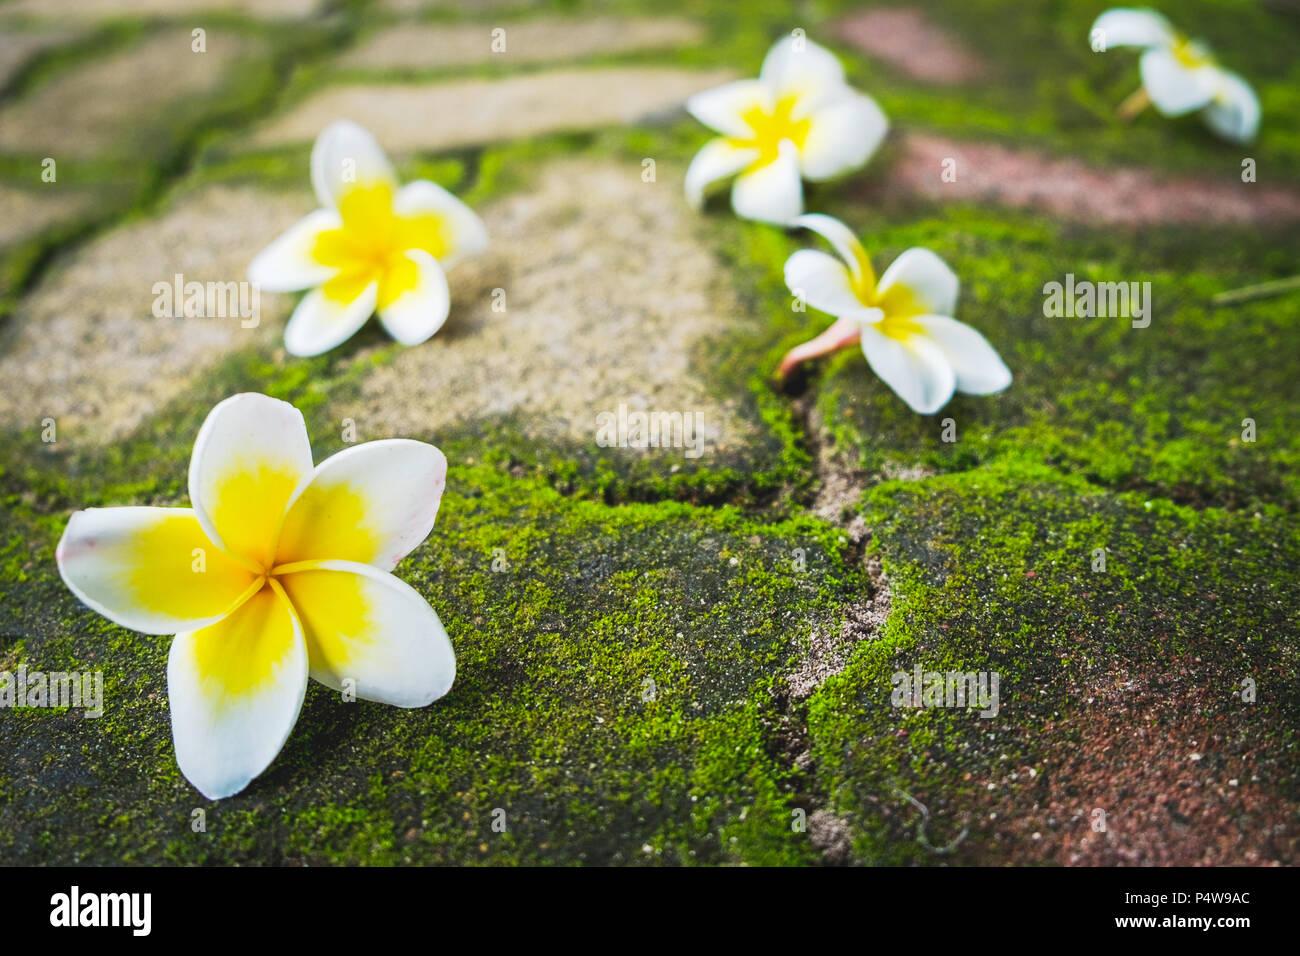 White Frangipani Plumeria Flowers With Green Moss On The Brick